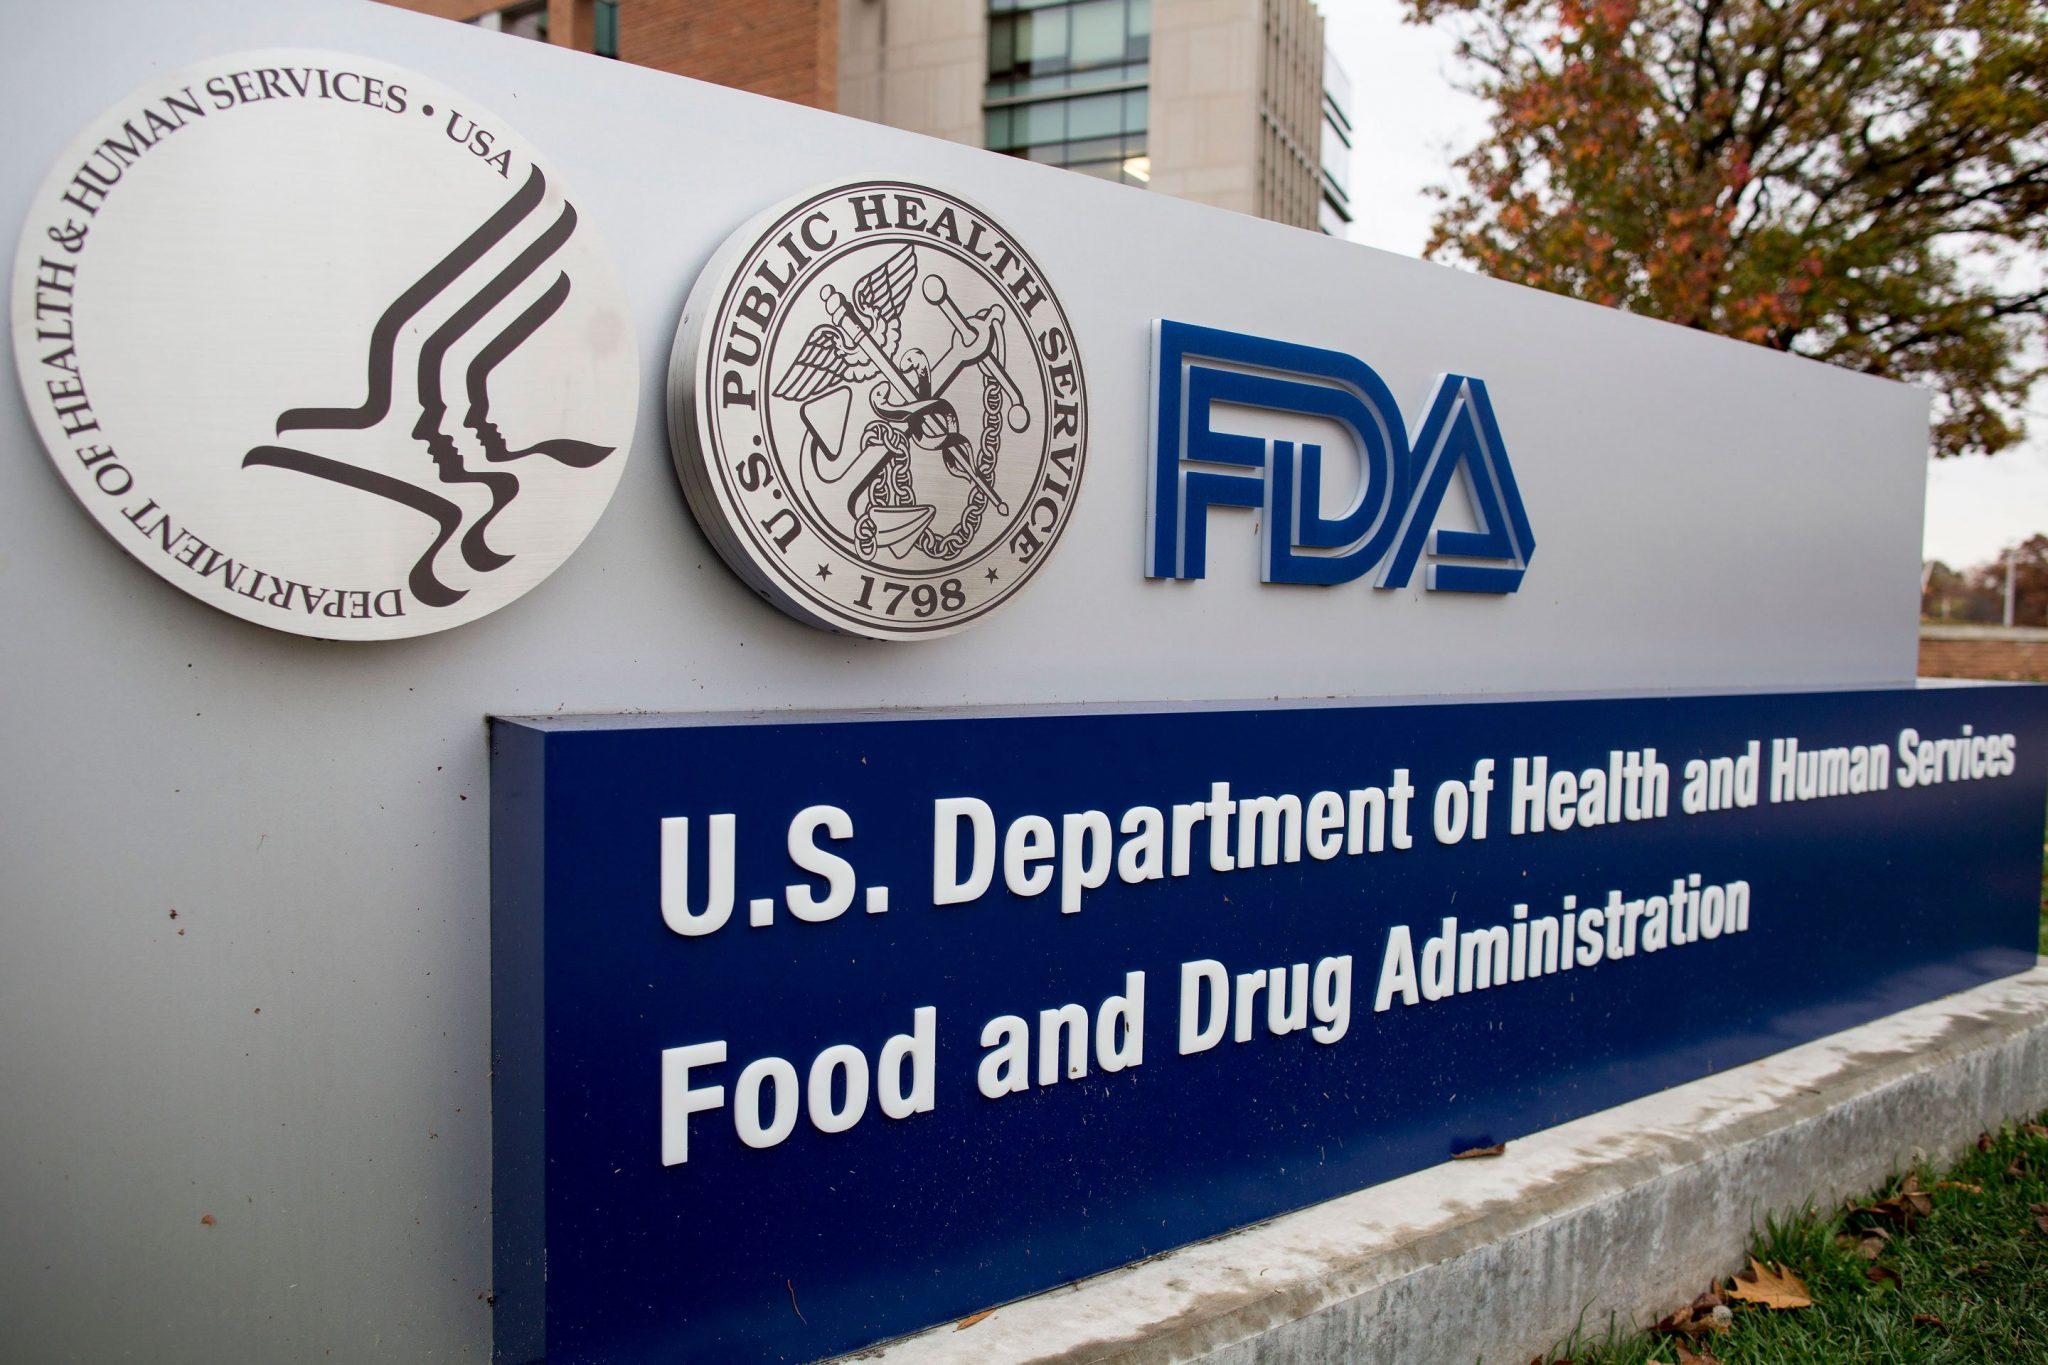 FDA - Захвачено и повреждено